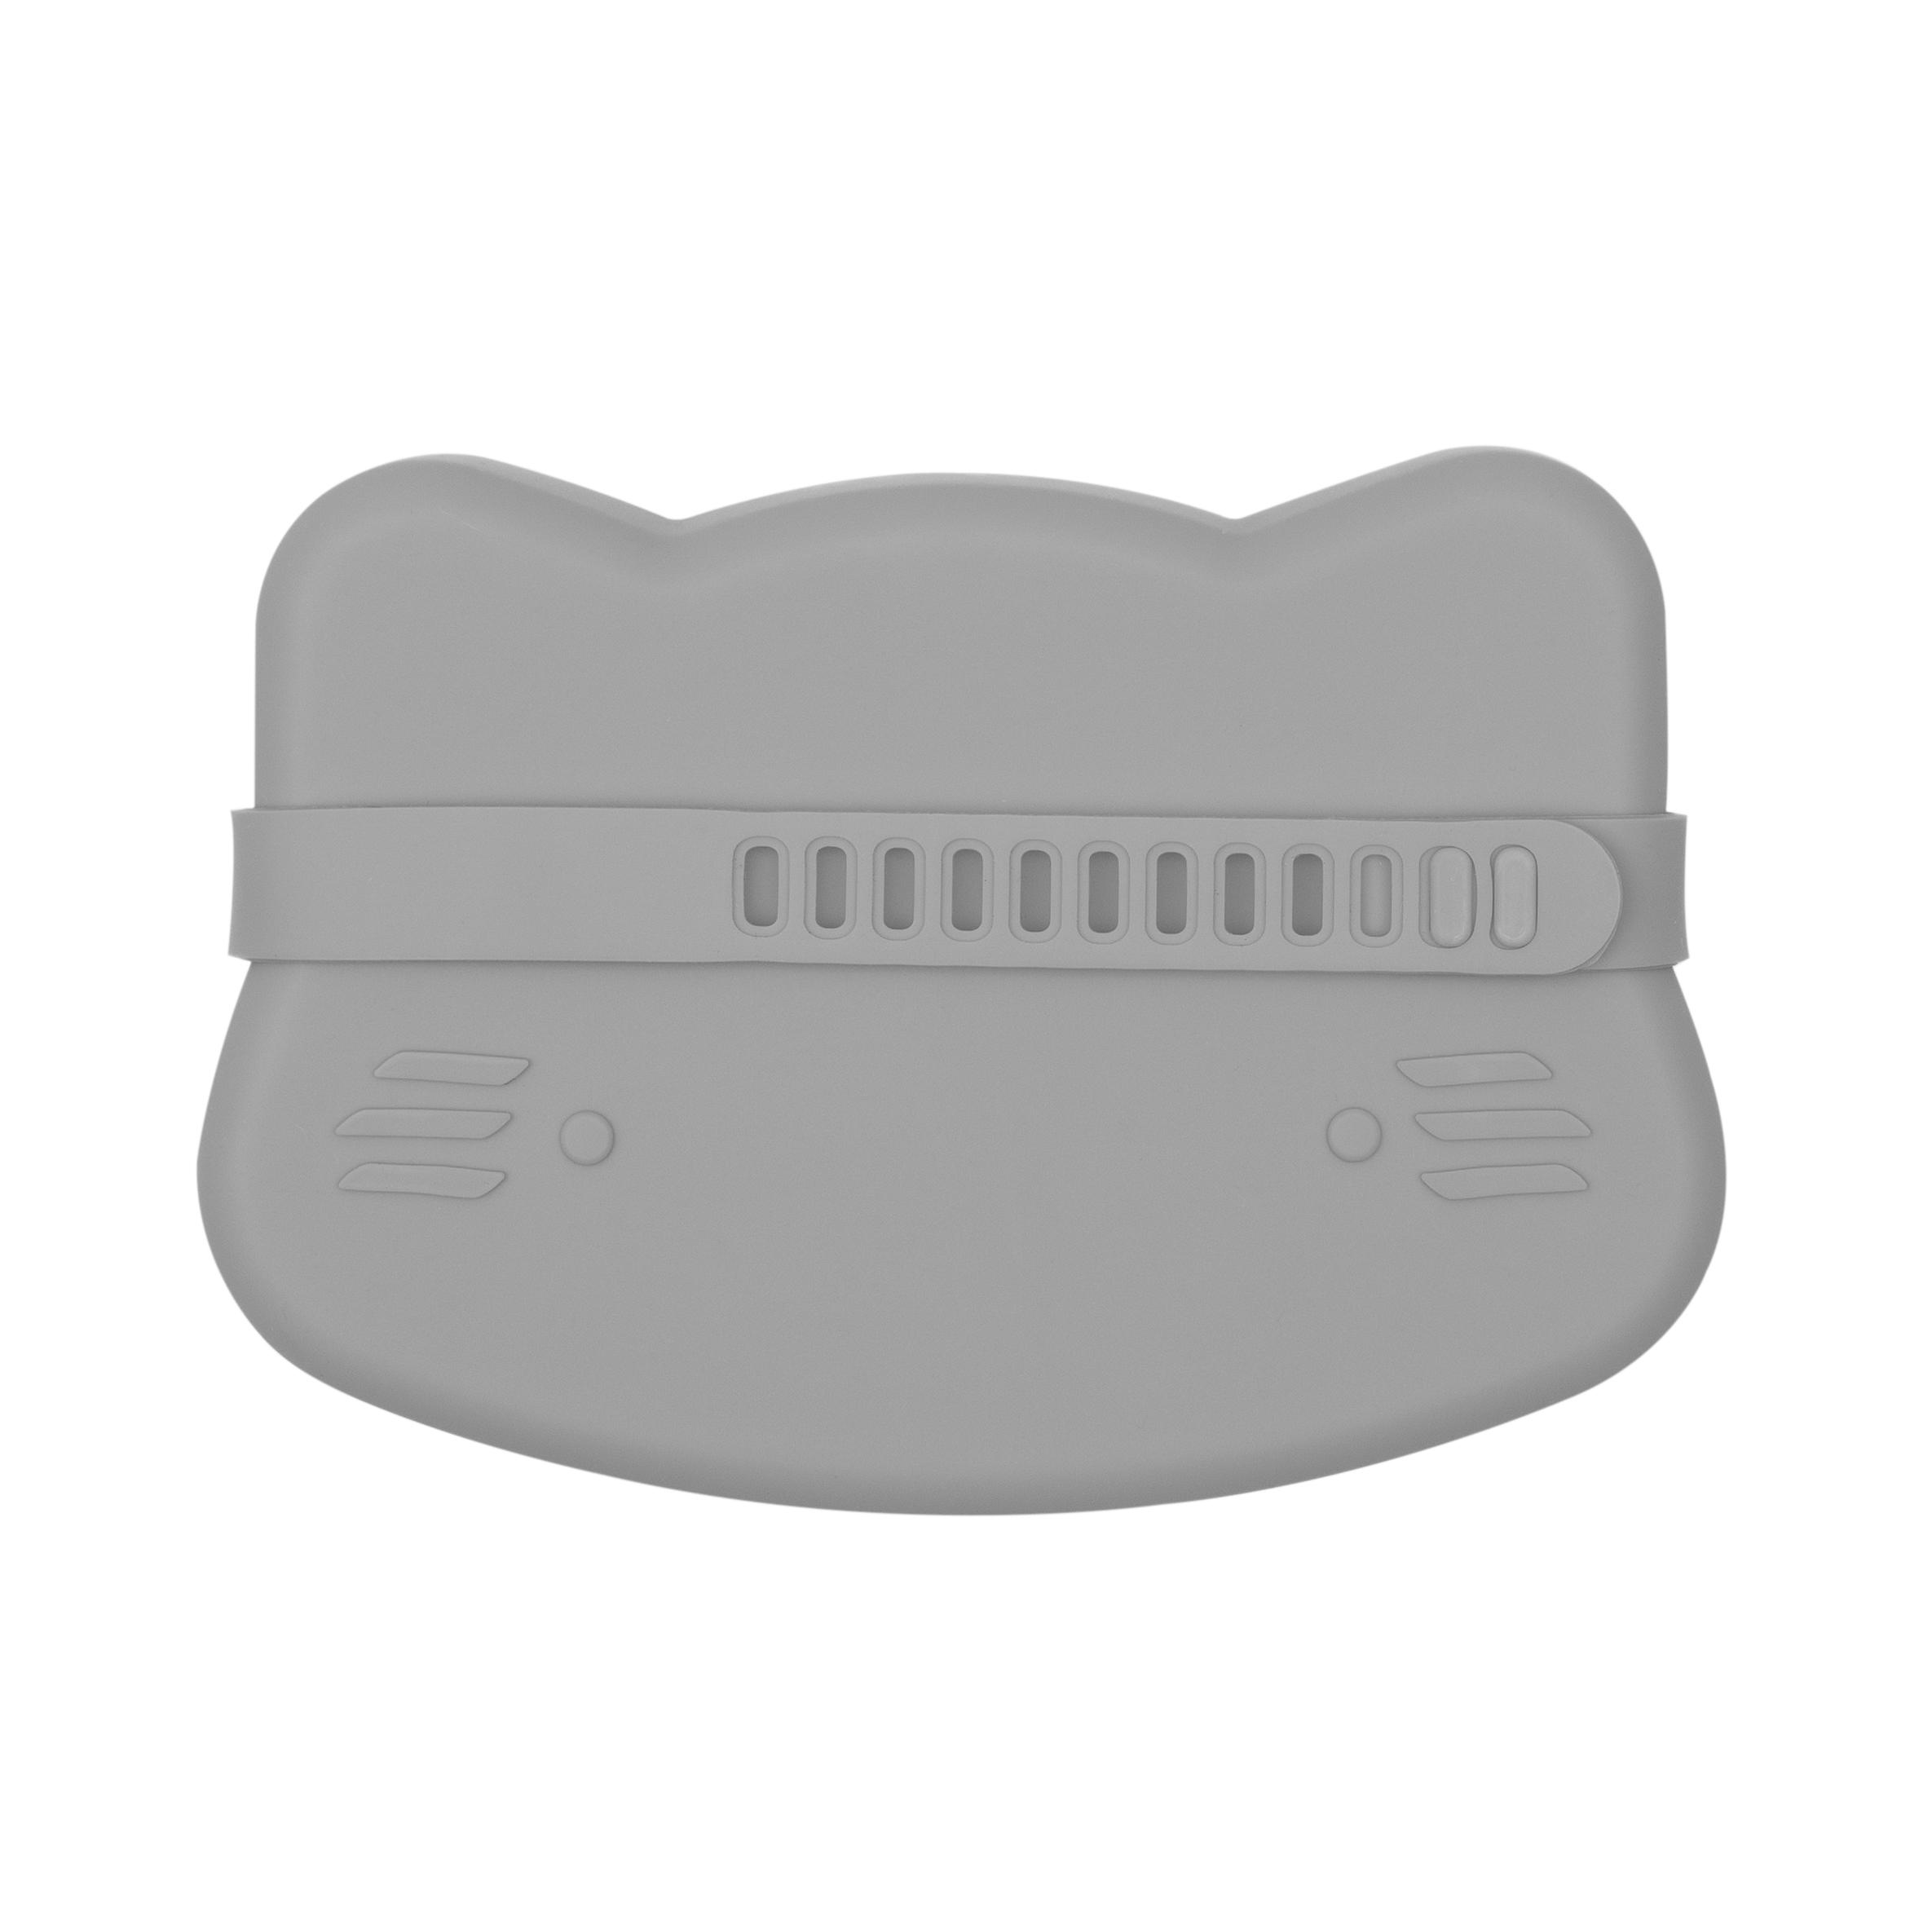 Boîte à goûter en silicone chat